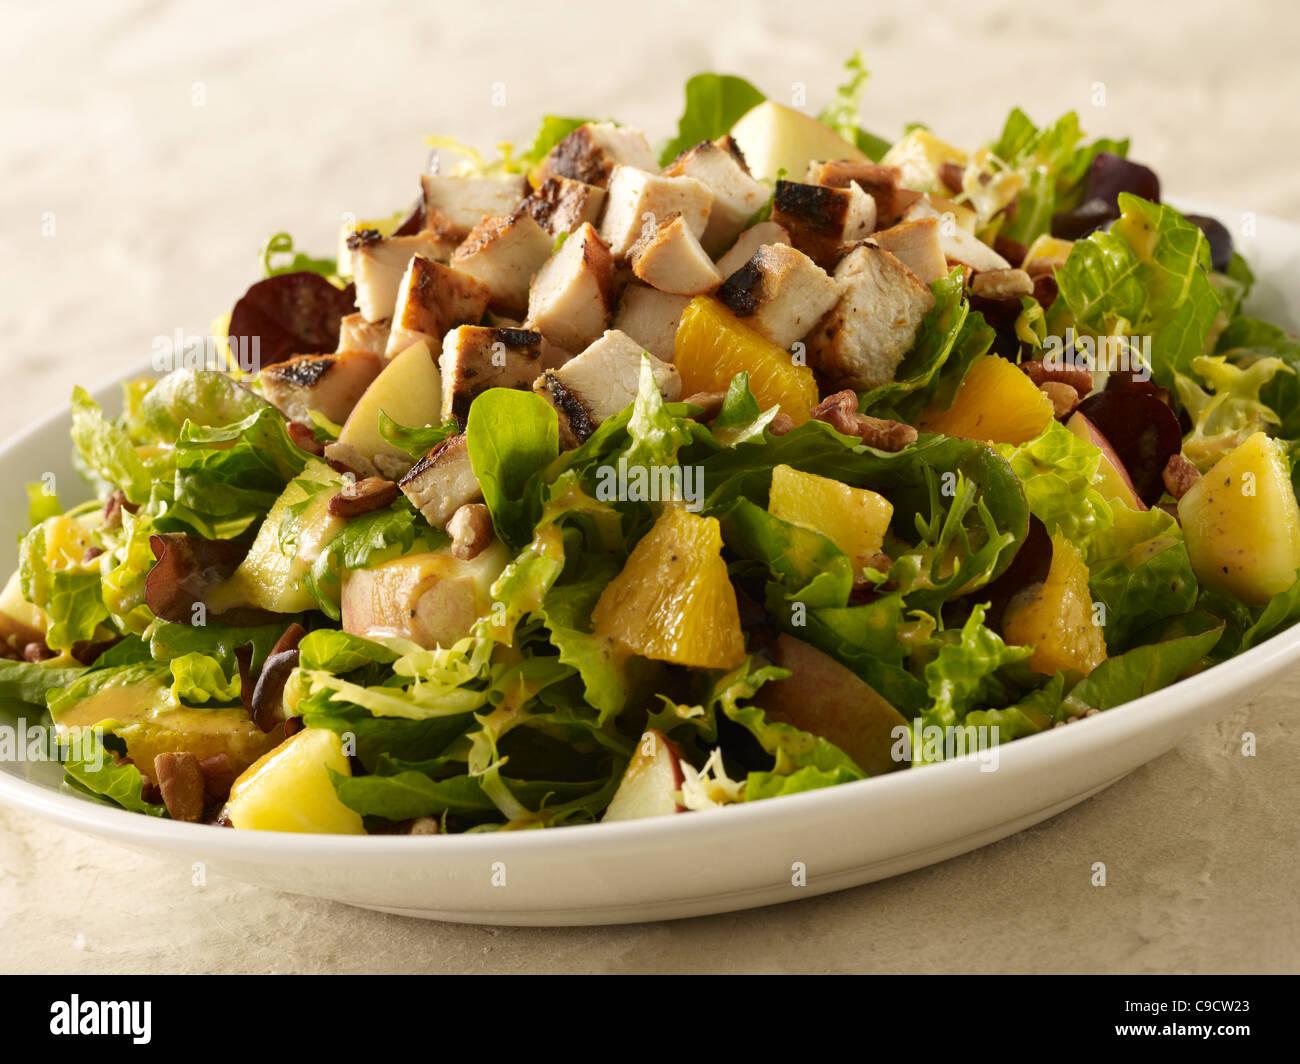 Grilled chicken, potato and orange salad - Stock Image